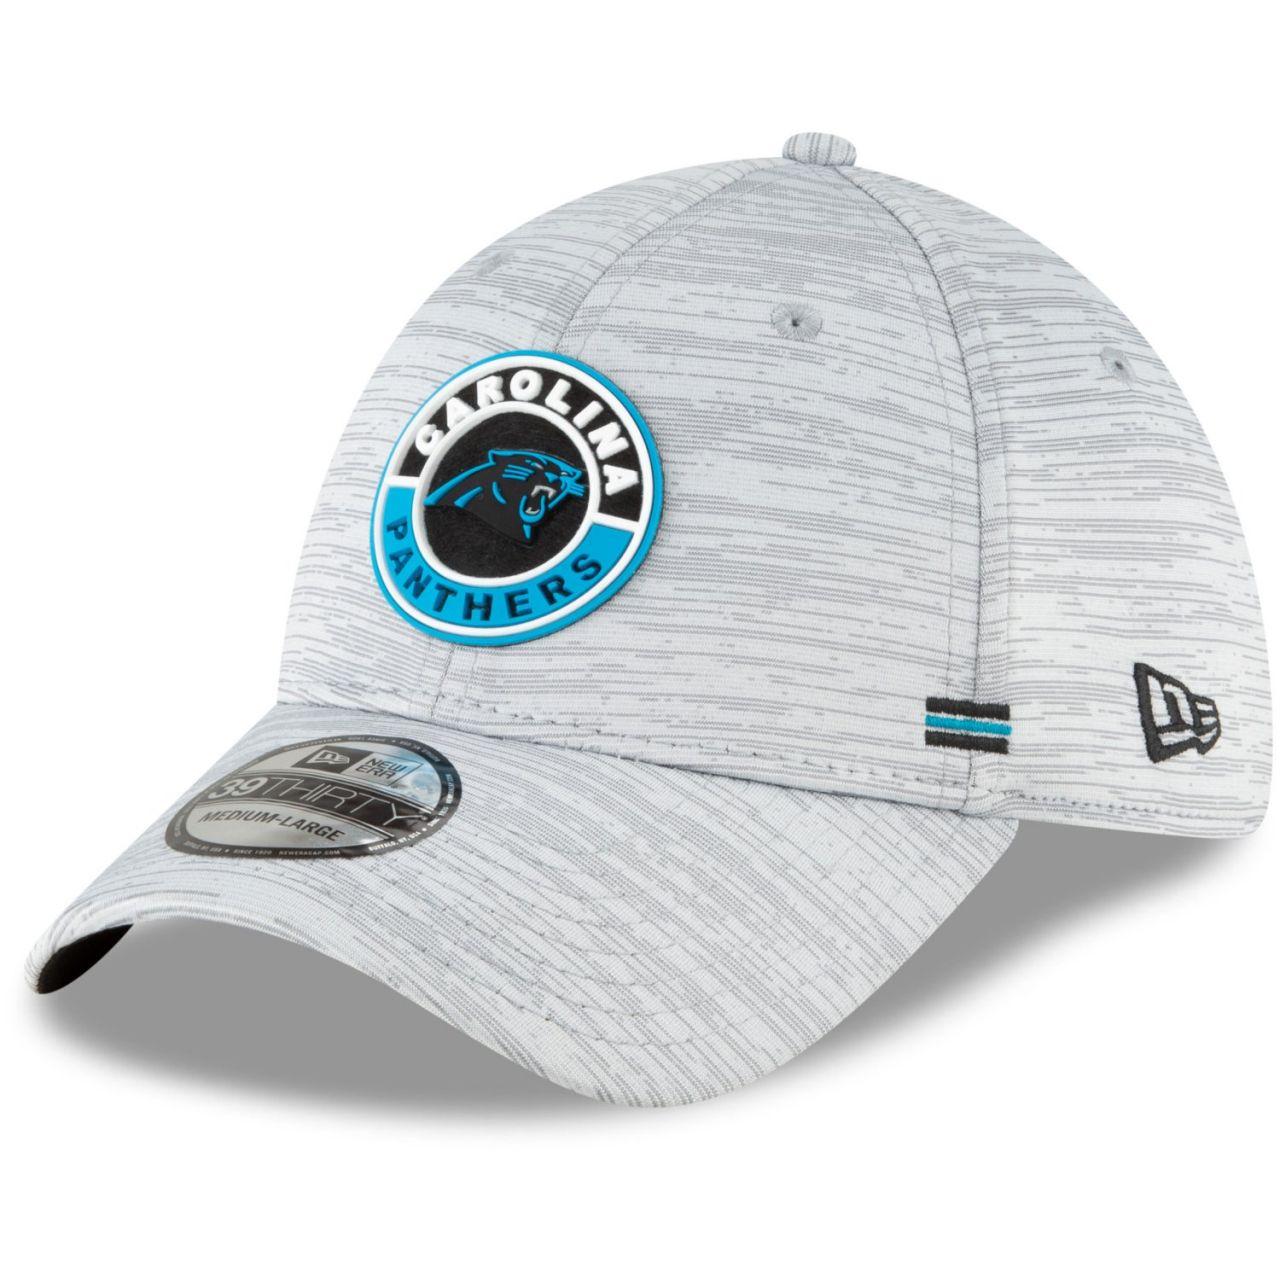 amfoo - New Era 39Thirty Cap - SIDELINE 2020 Carolina Panthers